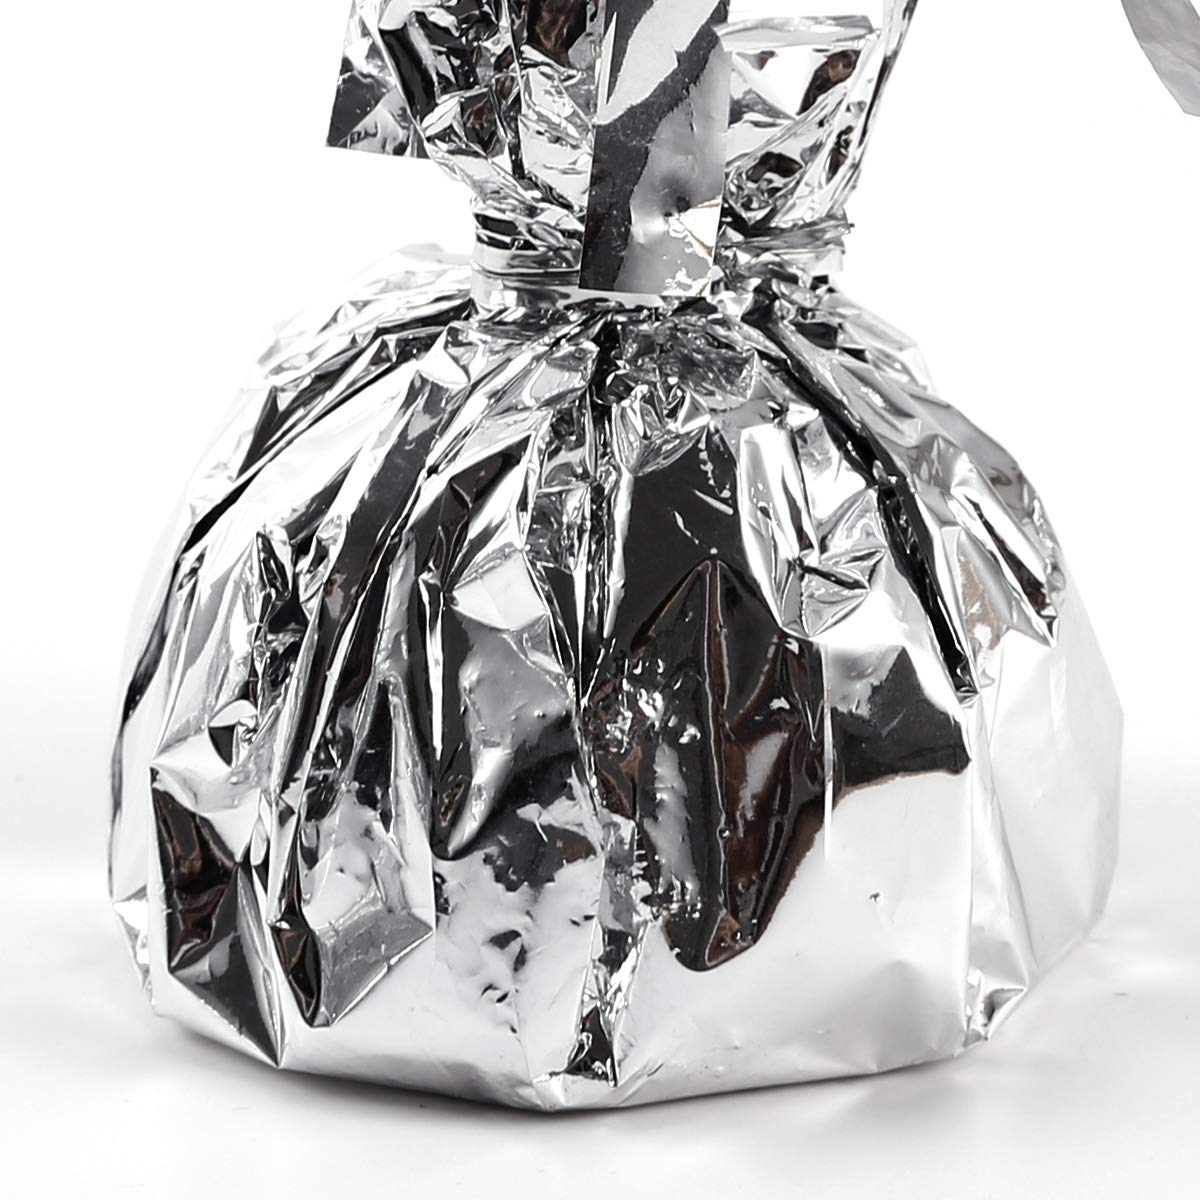 Iridescent 12 Helium Balloon Weights for Wedding Birthday Anniversary Party Decorate